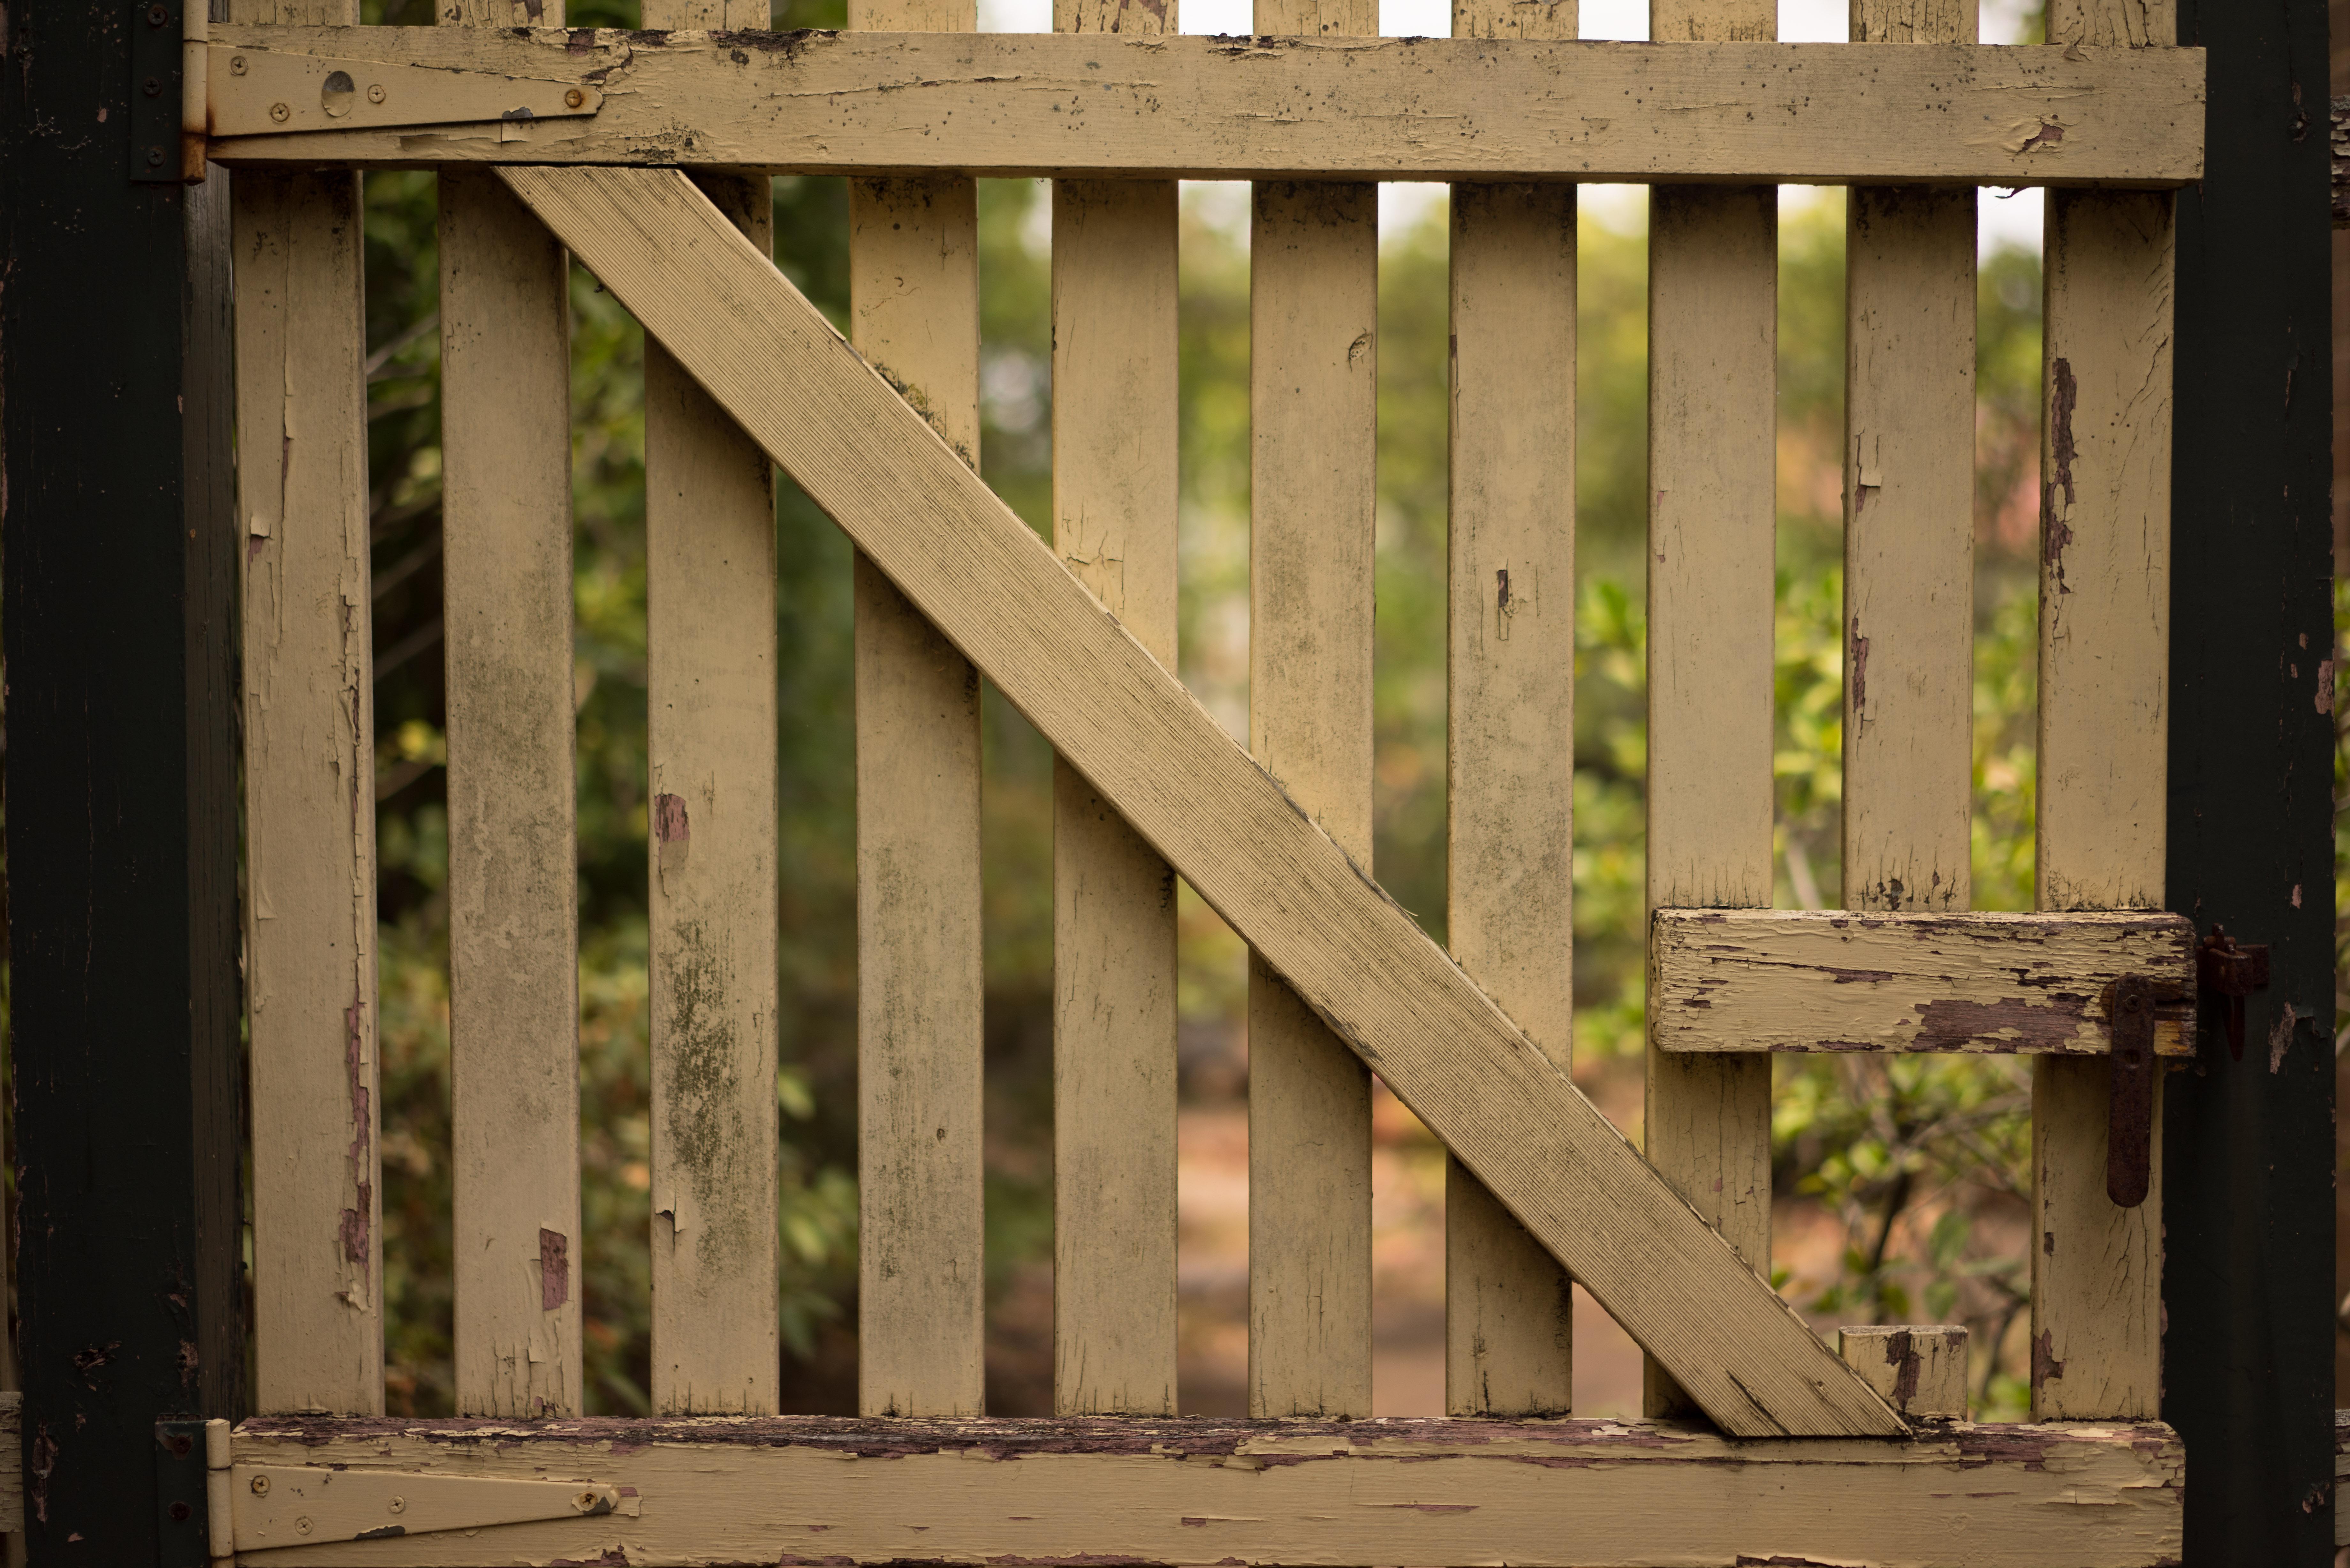 Gate (Sony Carl Zeiss Sonnar ZA FE55 55mm f1.8)